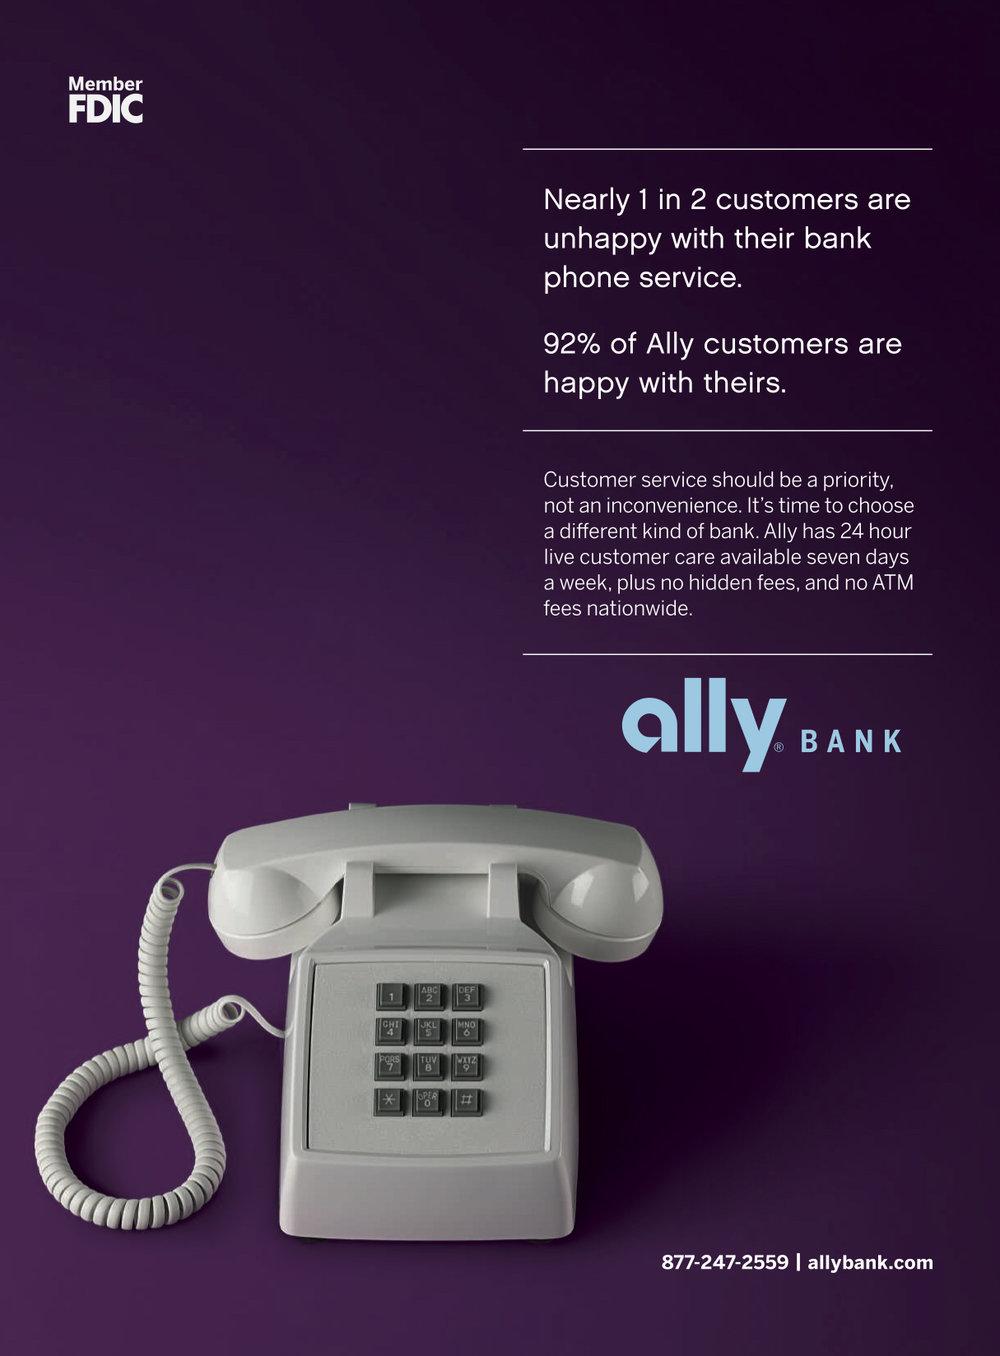 work_ally_cnn_phone.jpg